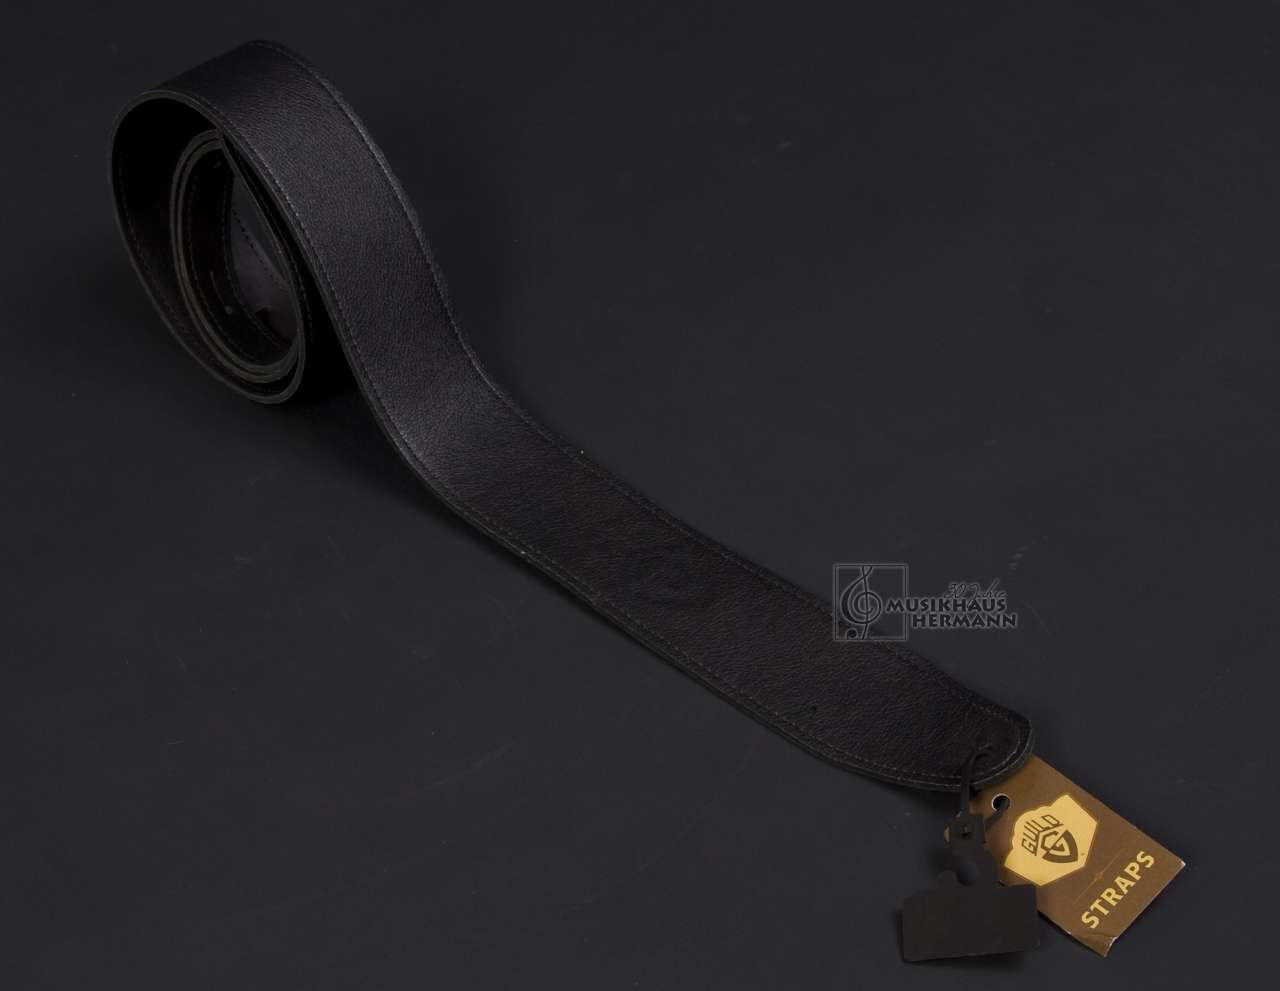 Gitarrengurt Guild USA Leder Standard - schwarz 350-0611-051